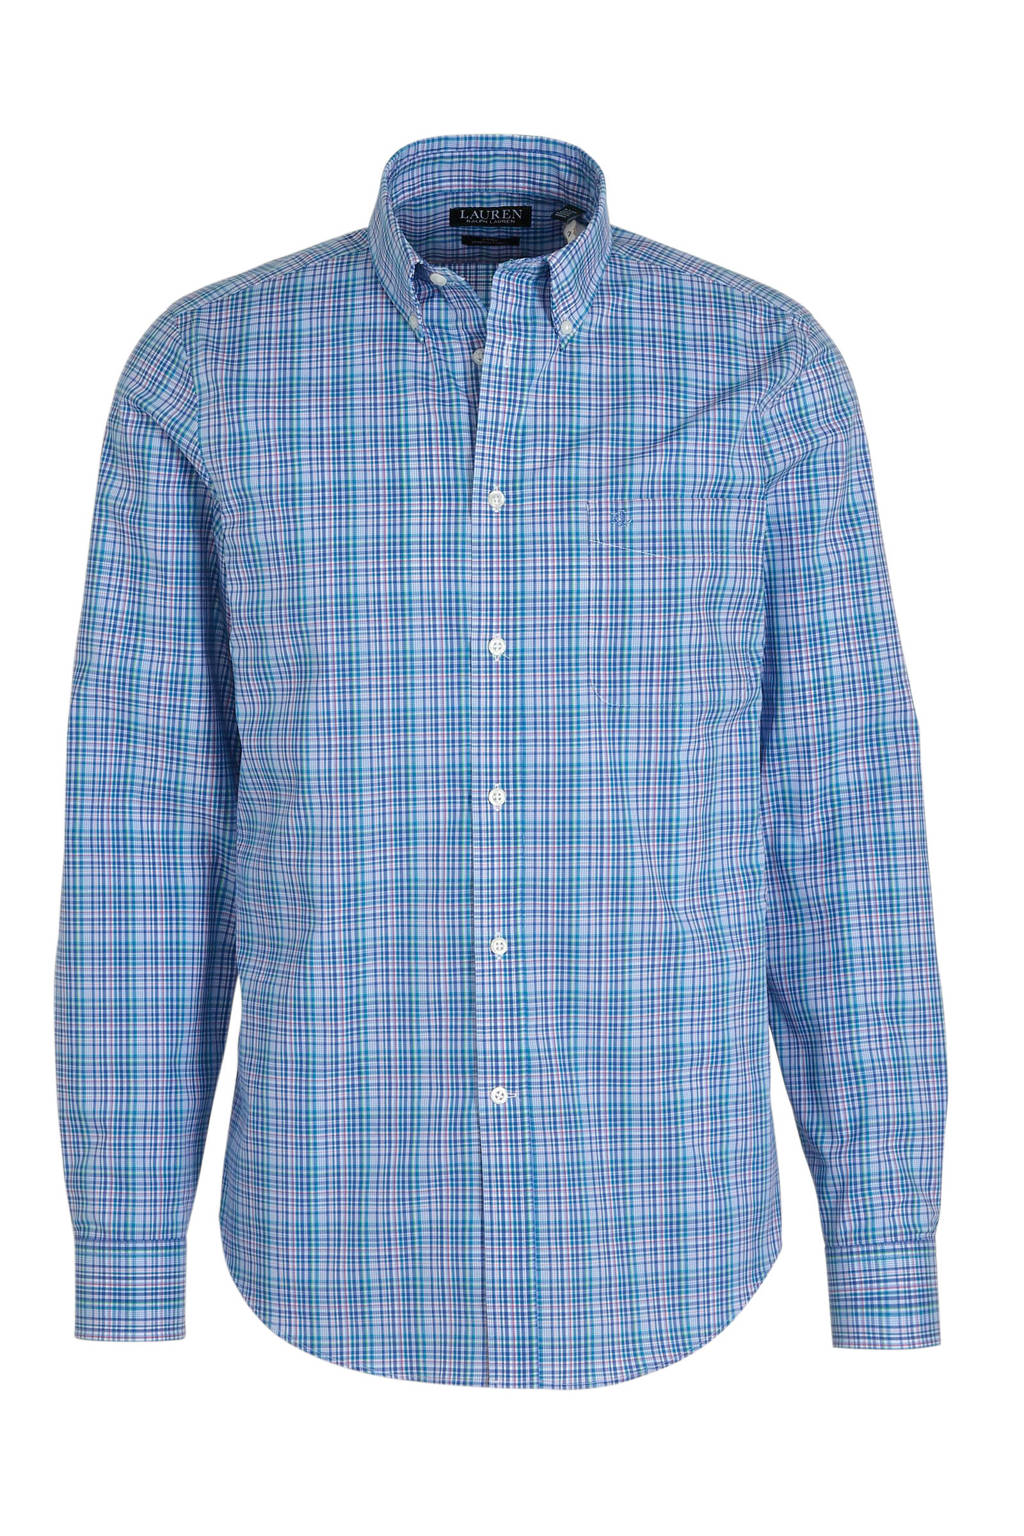 POLO Ralph Lauren geruit slim fit overhemd blauw, Blauw